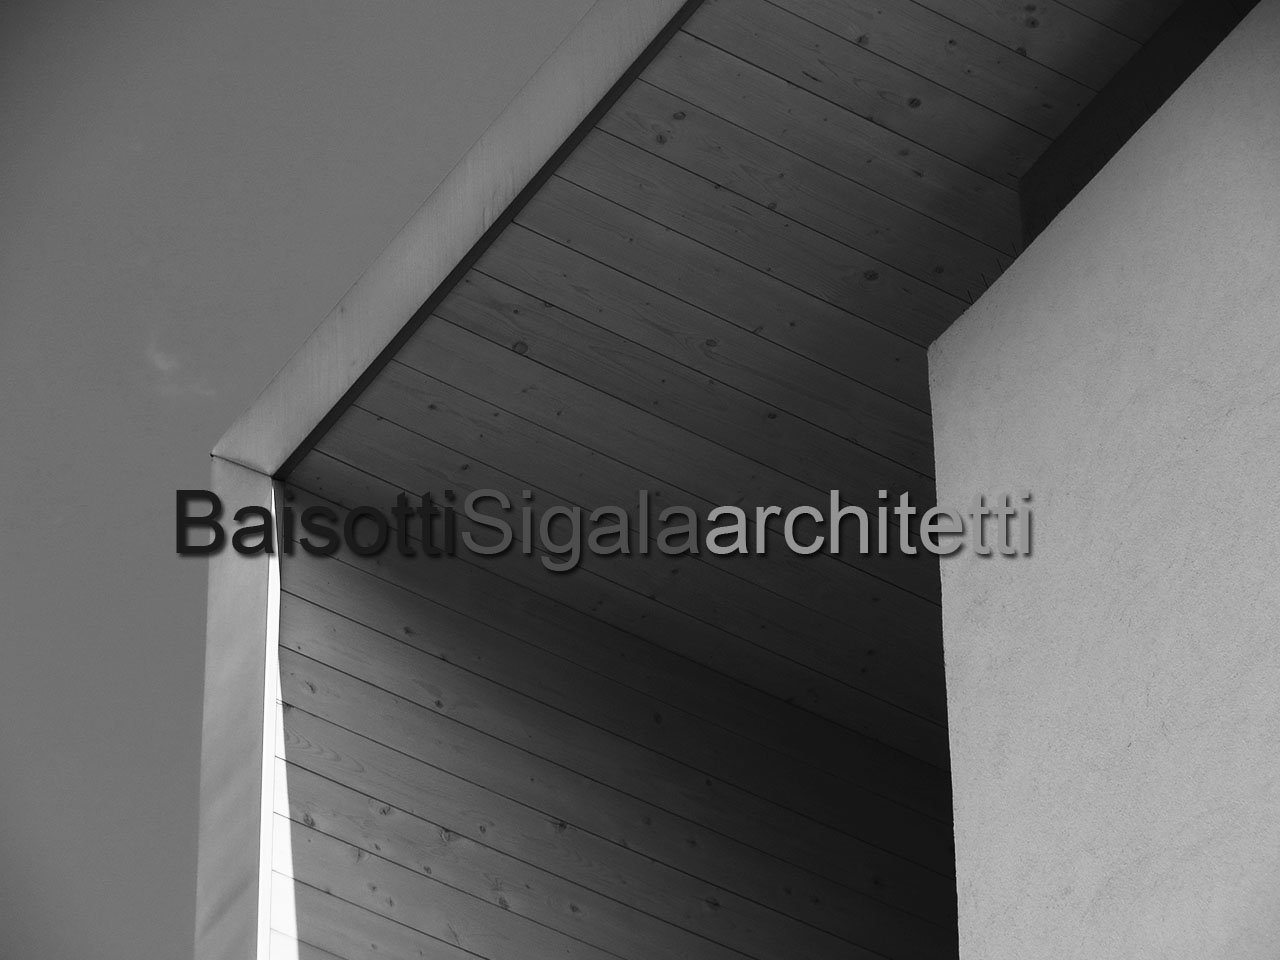 siti-internet-seo-newsletter-social-network-baisotti-sigala-contessifostinelli-